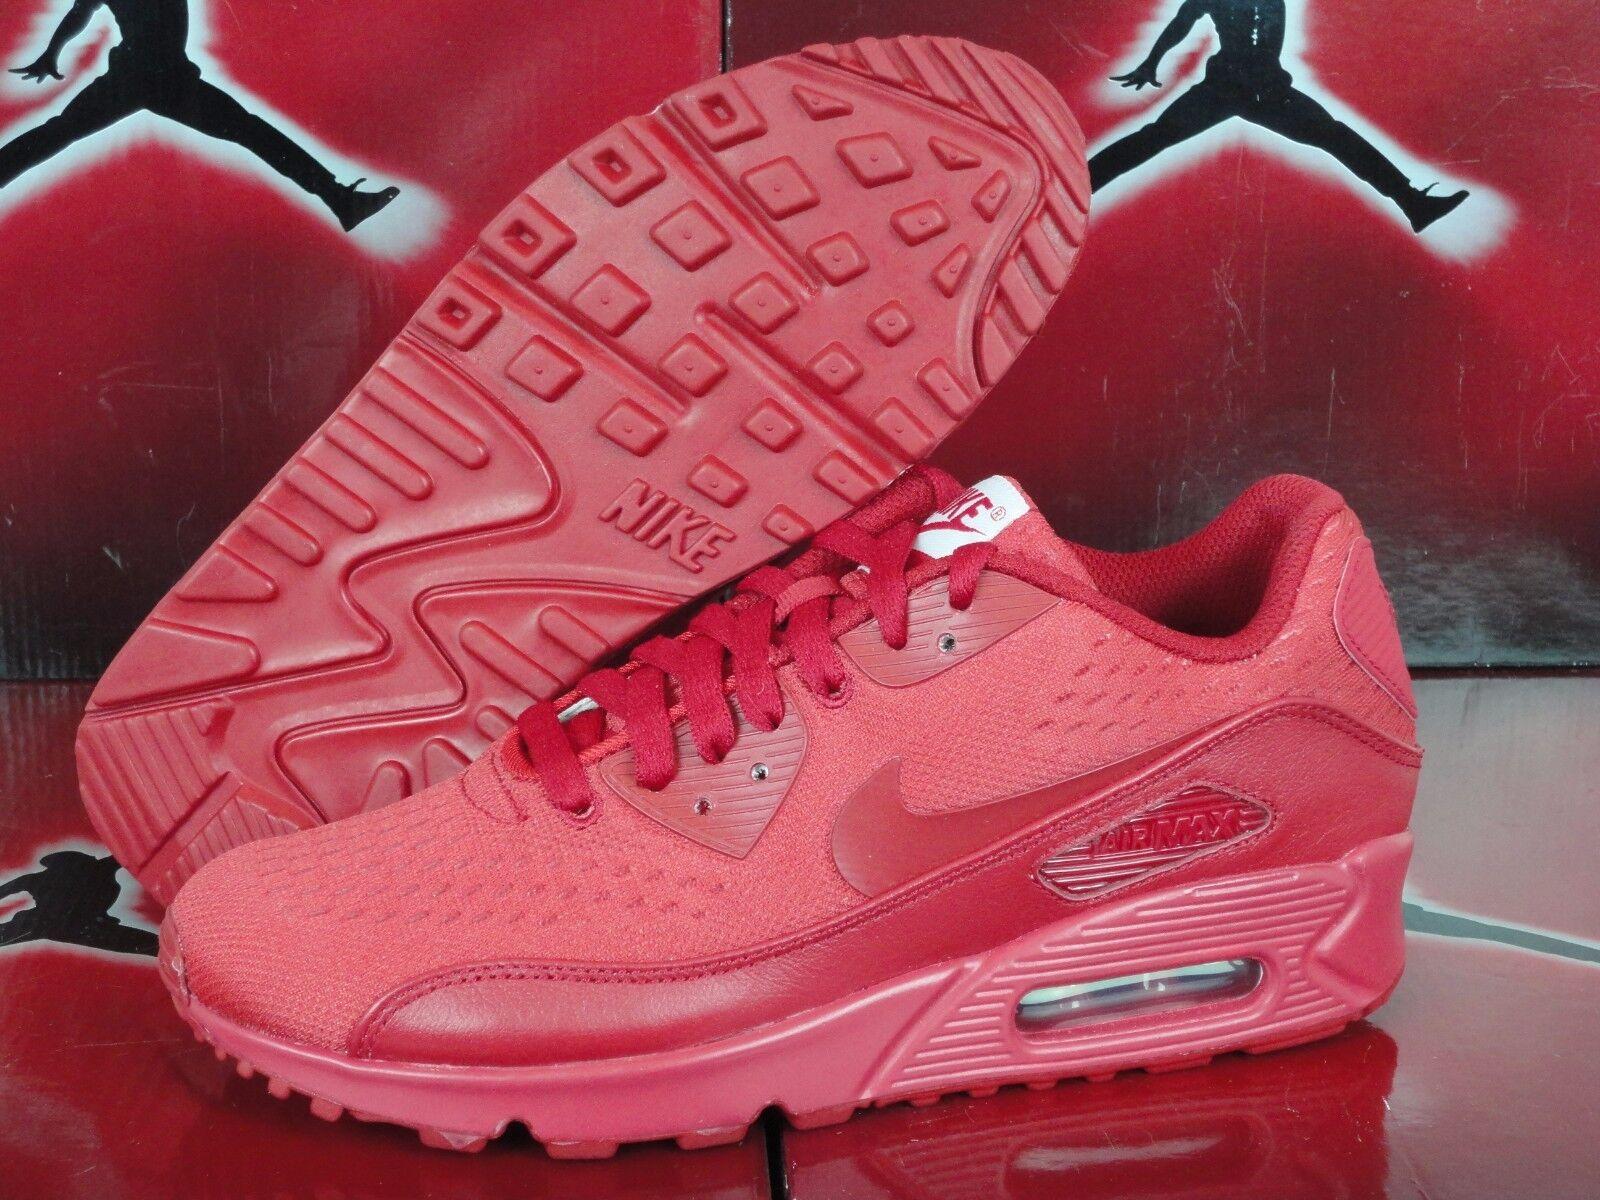 NEW Nike Air Max 90 EM NikeiD ID Sz 7.5 WOMENS All Red October Yeezy Custom